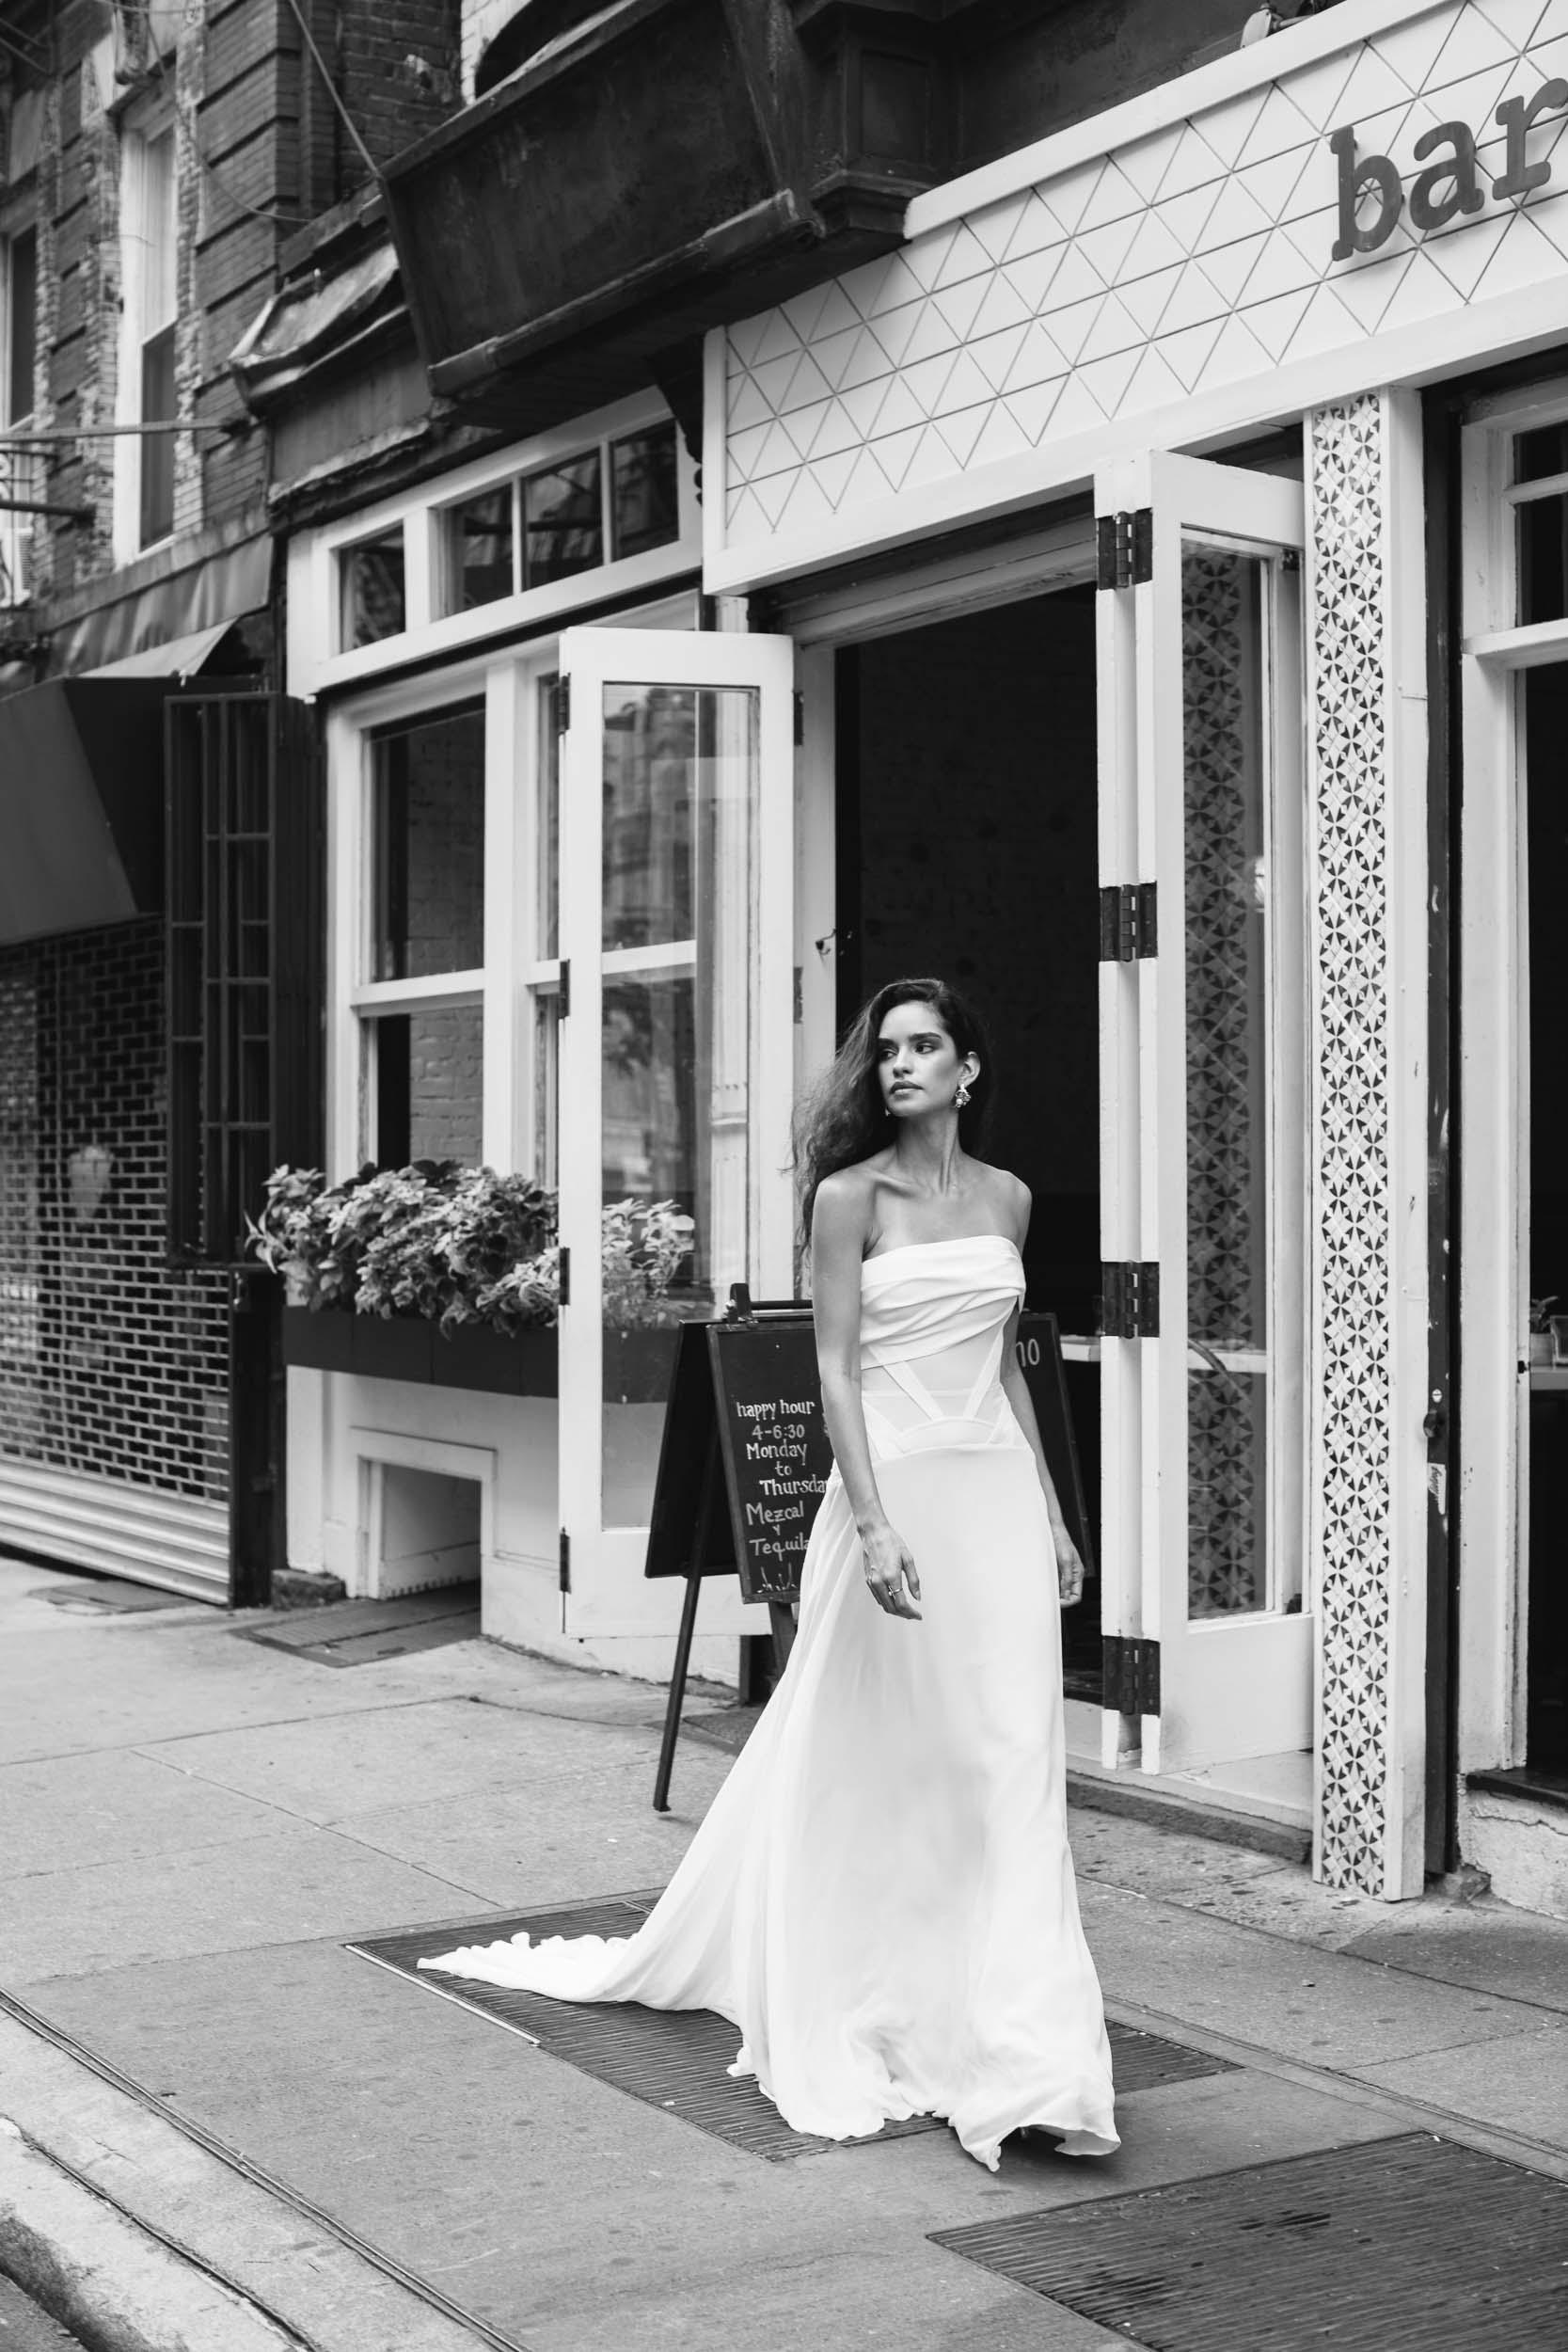 Kas-Richards-Fashion-Editorial-Photographer-New-York-Georgia-Young-Couture-21.jpg